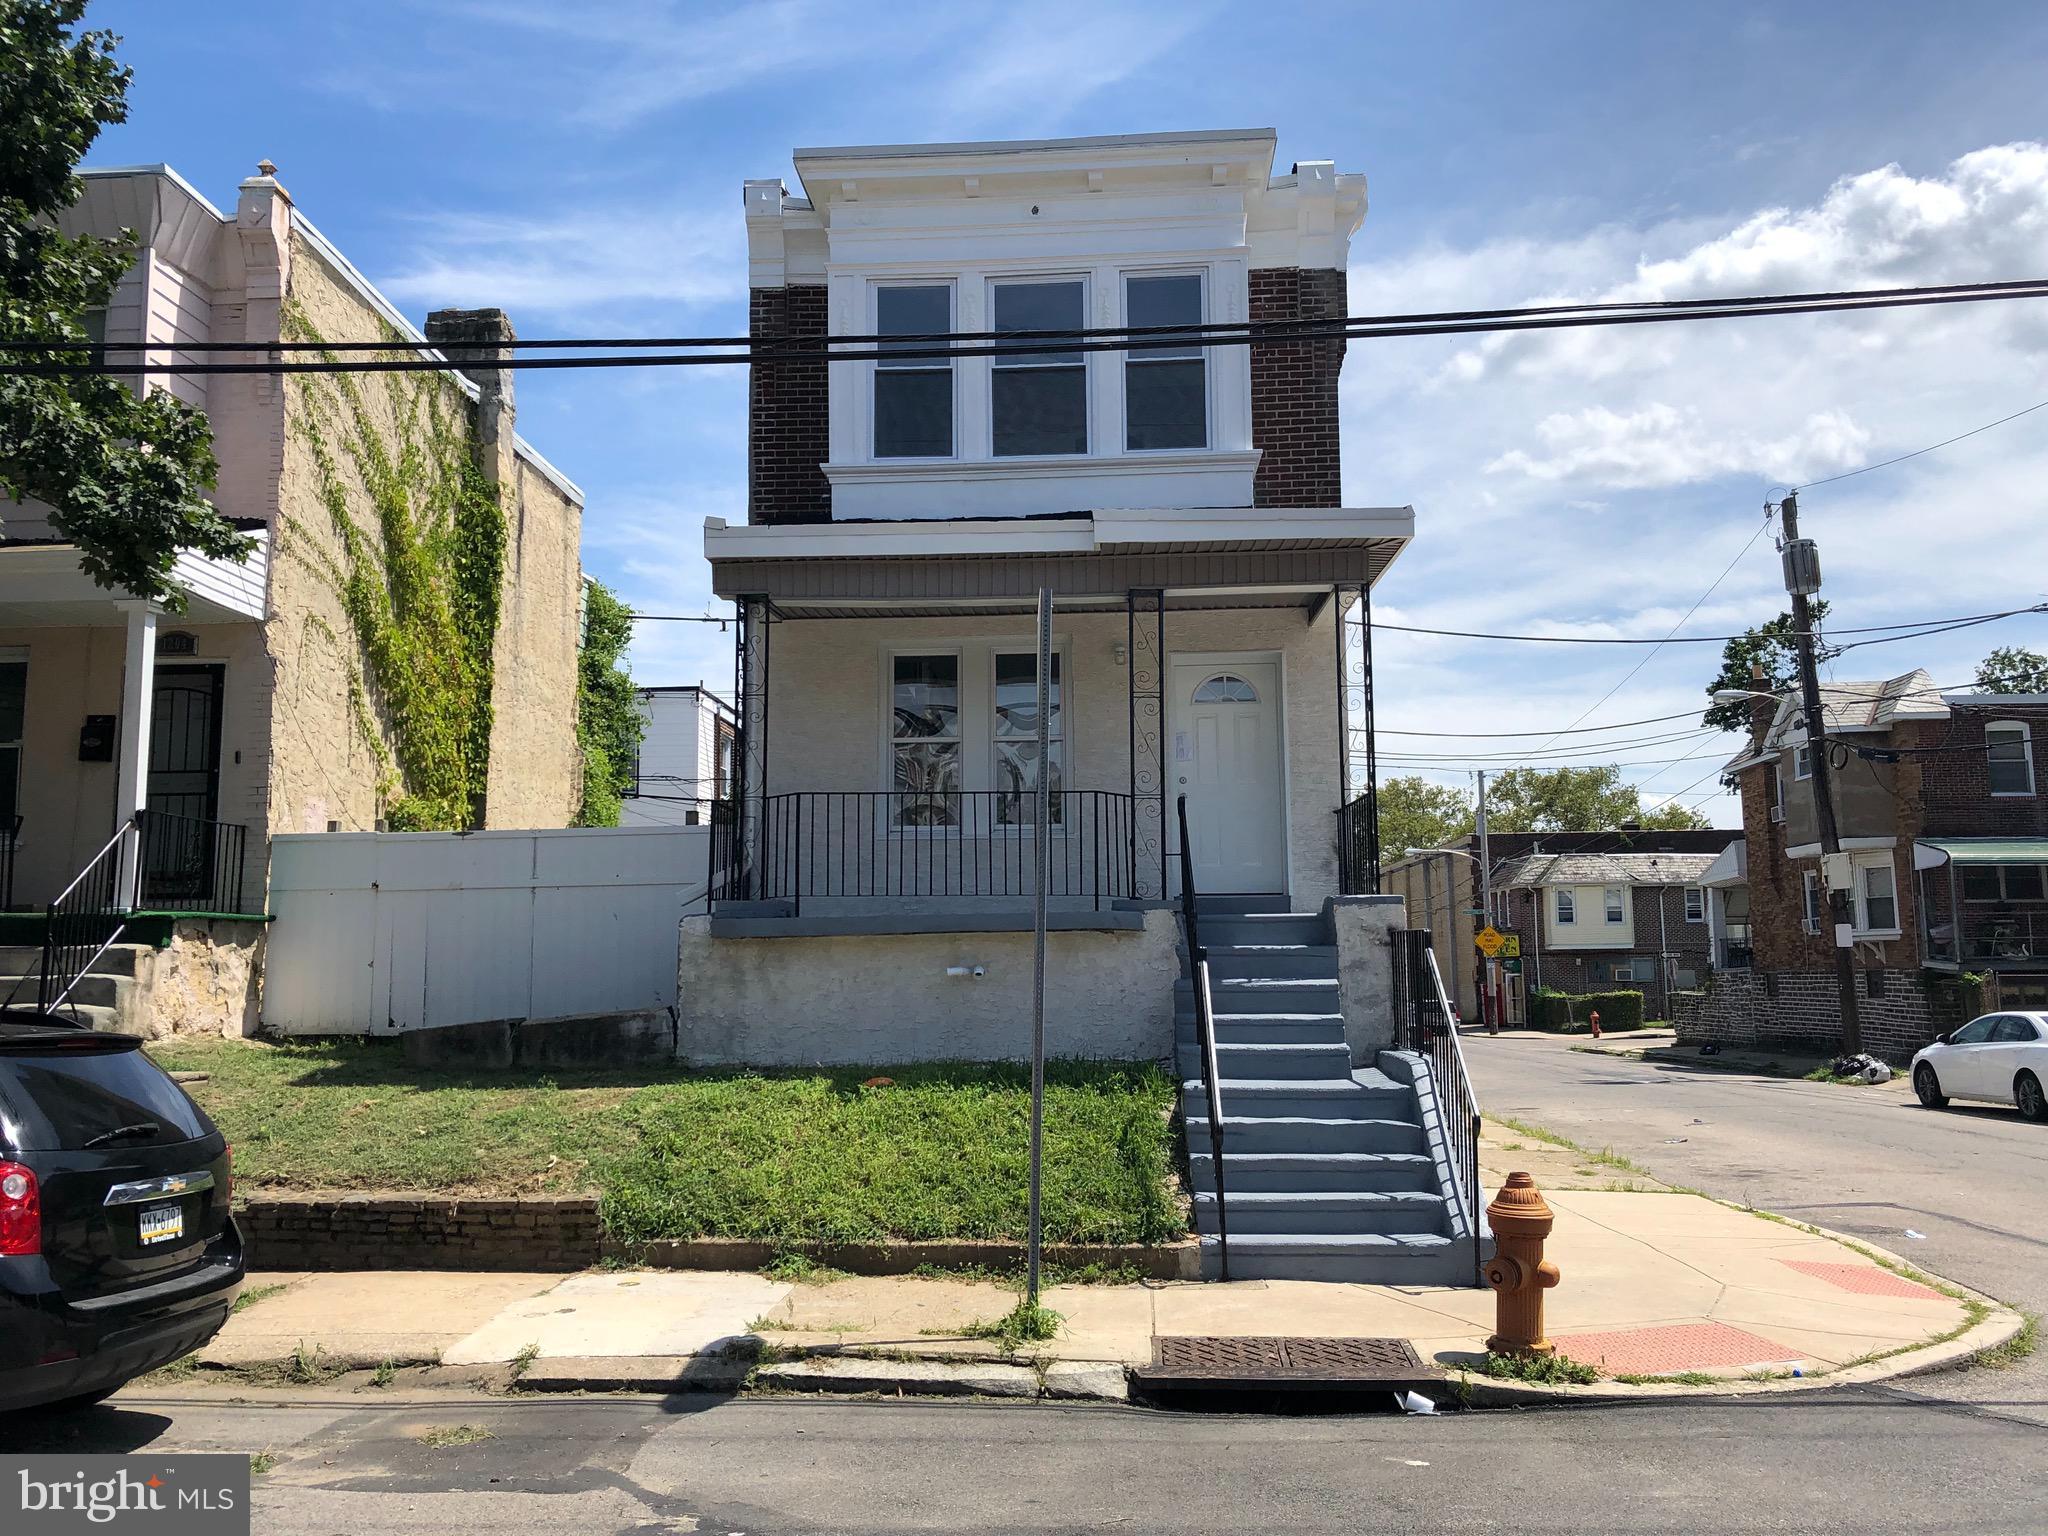 1200 E PRICE STREET, PHILADELPHIA, PA 19138